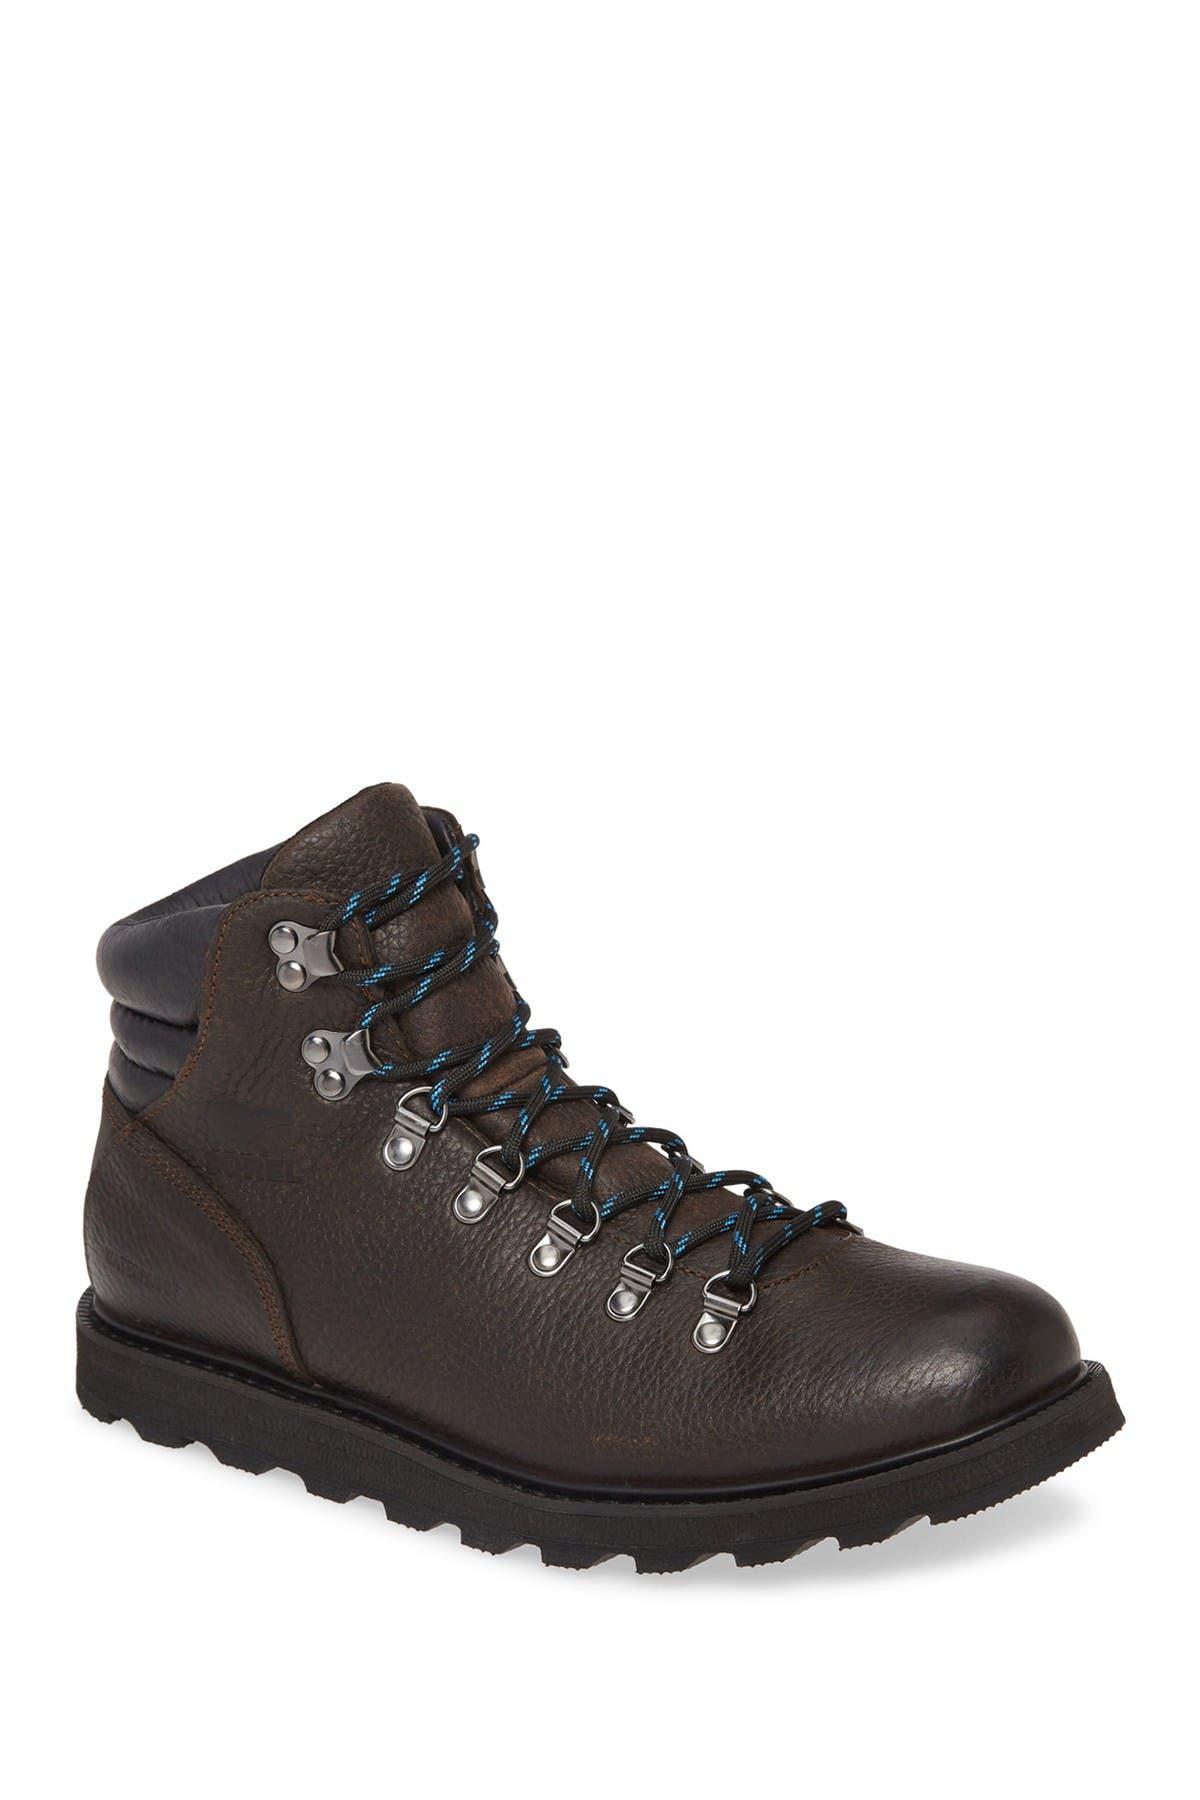 Sorel   Madson Waterproof Hiker Boot